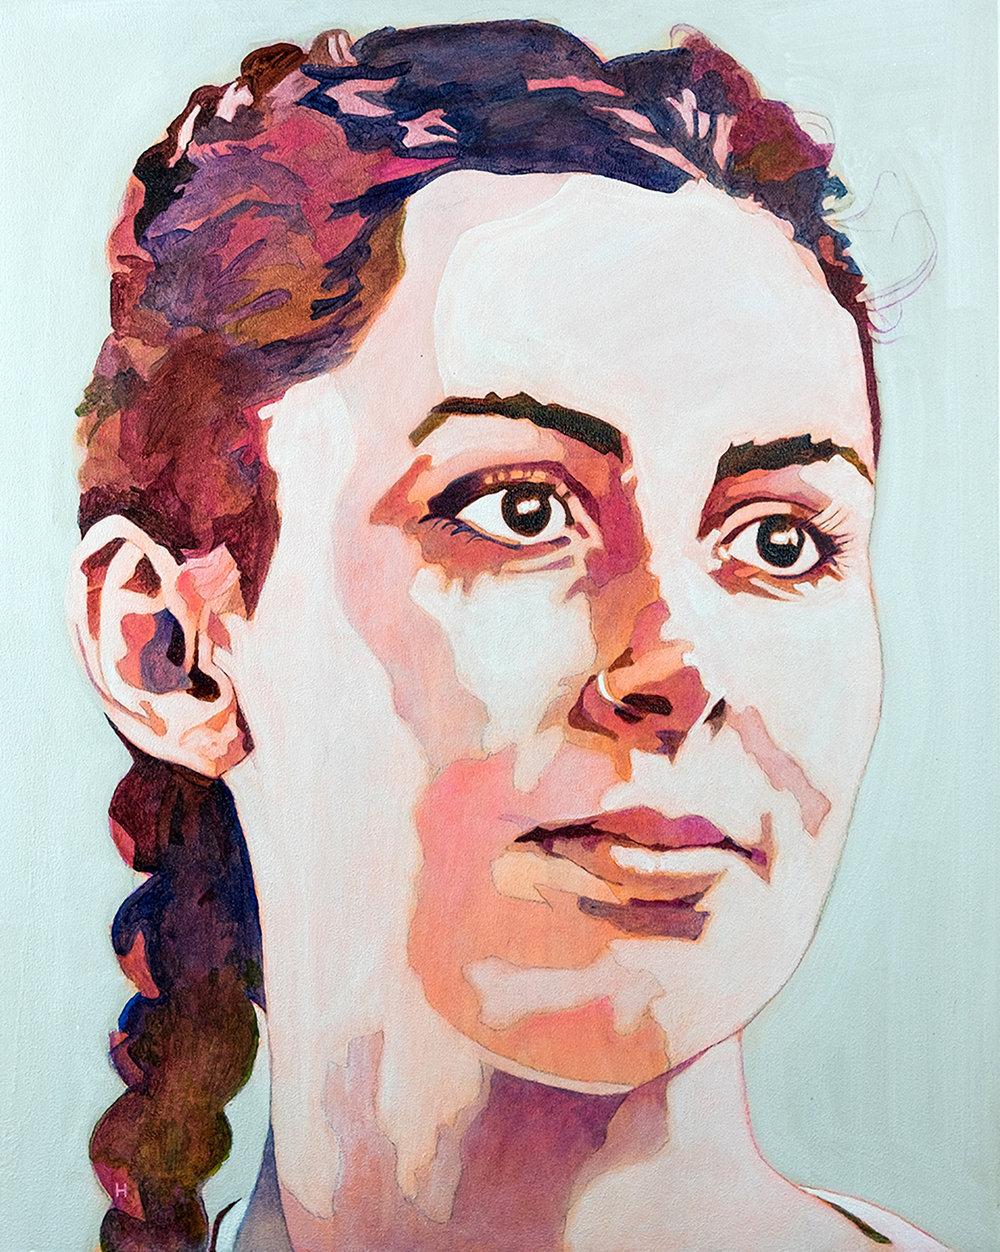 Alex Waggoner, Painter & Printmaker